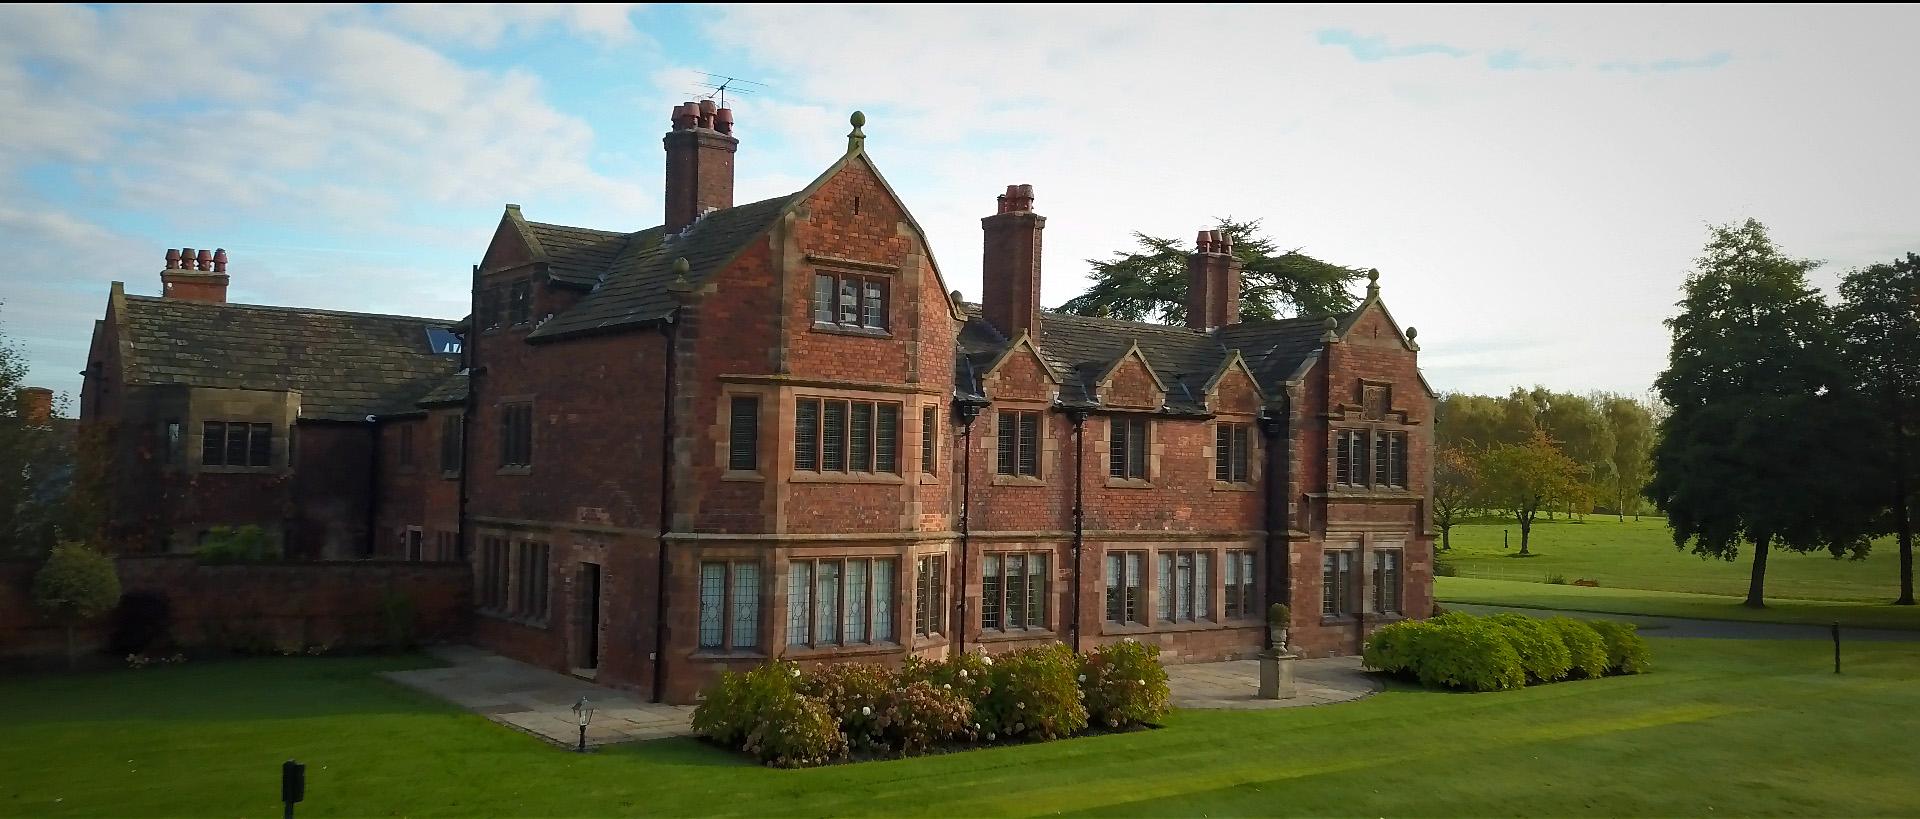 Colshaw Hall